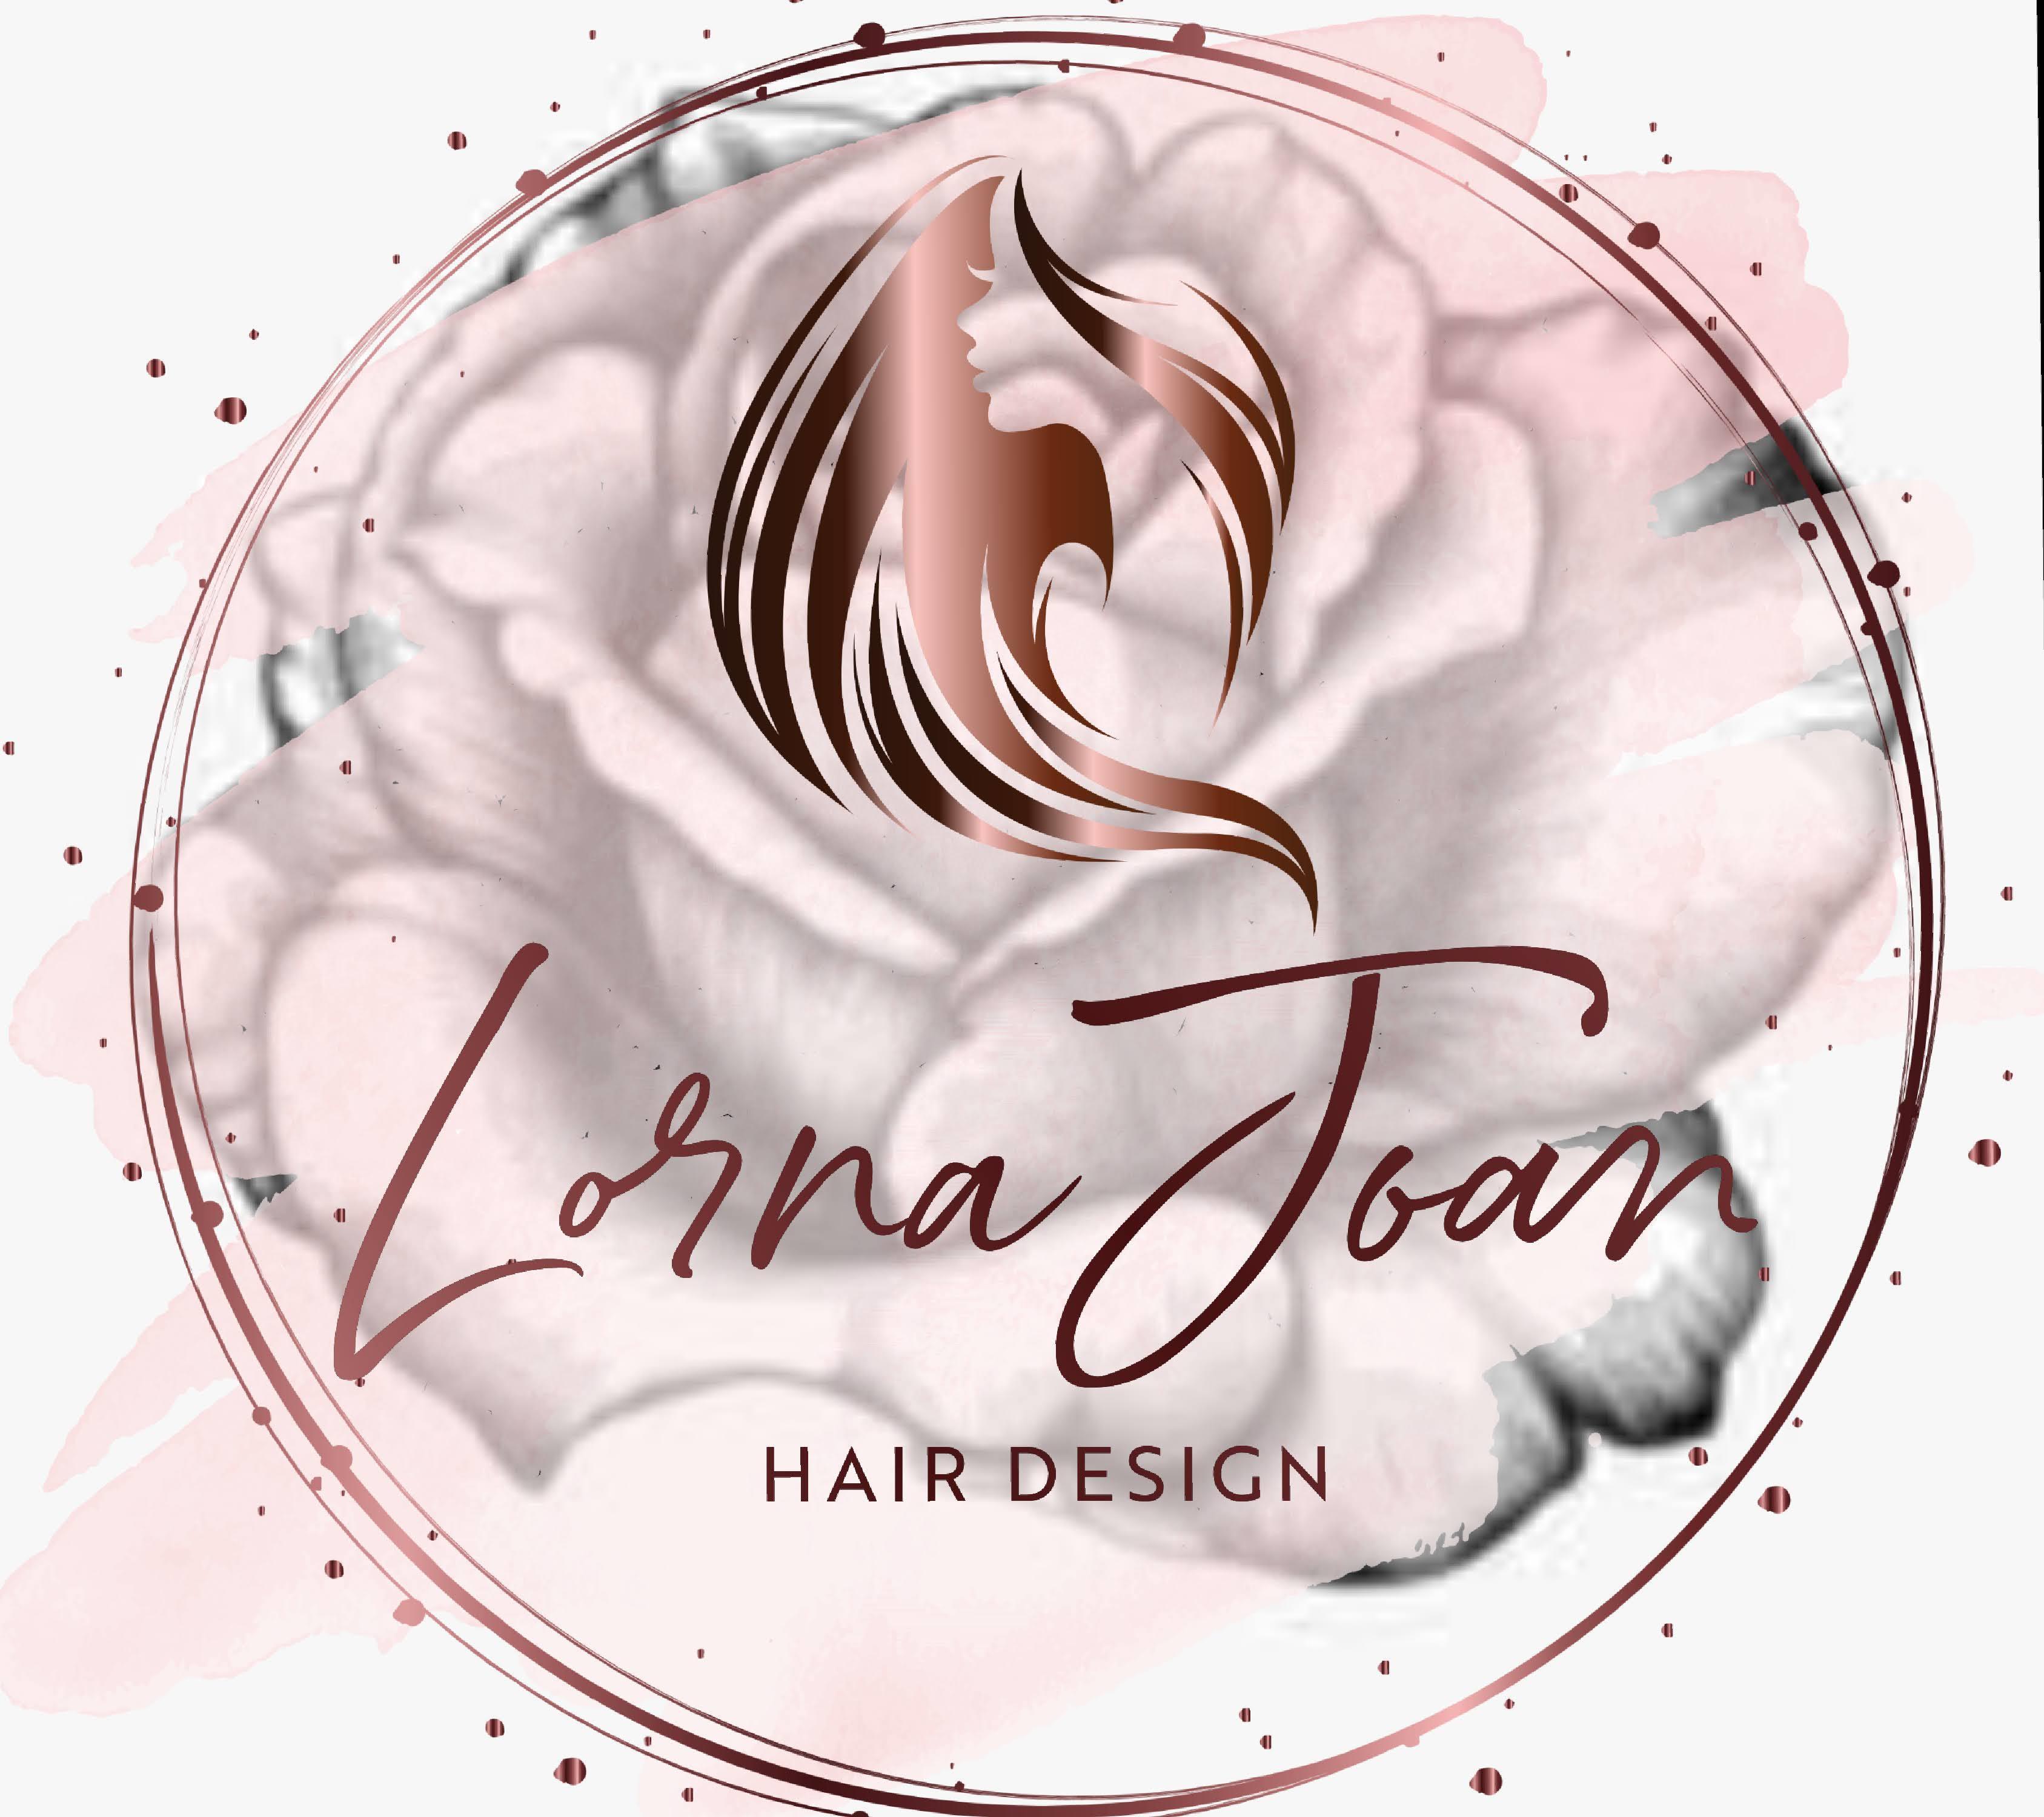 Lorna Joan Hair Design